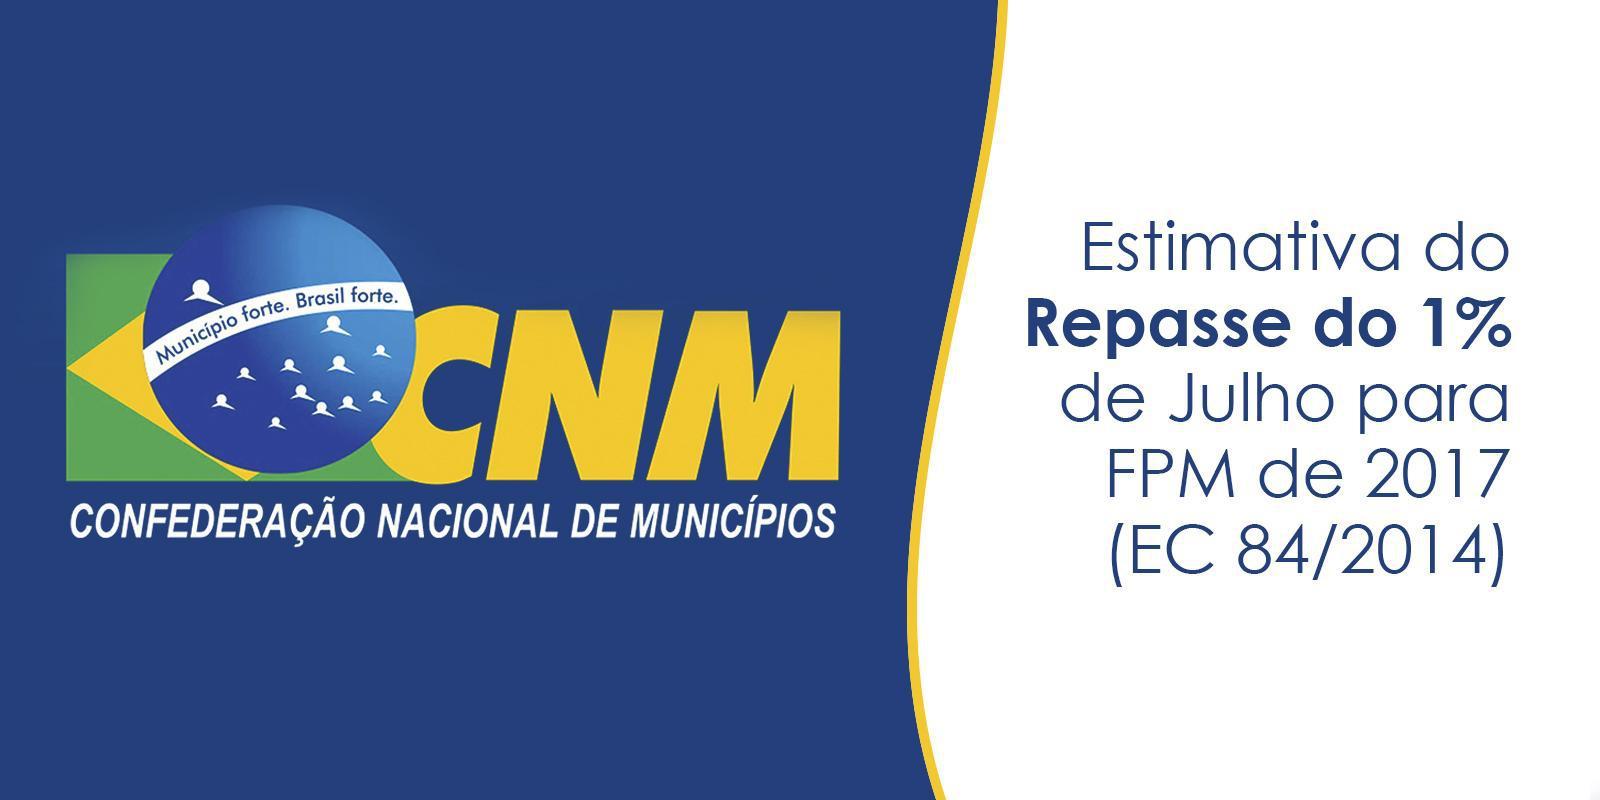 FPM extra de 2017 - (EC 84/2014)